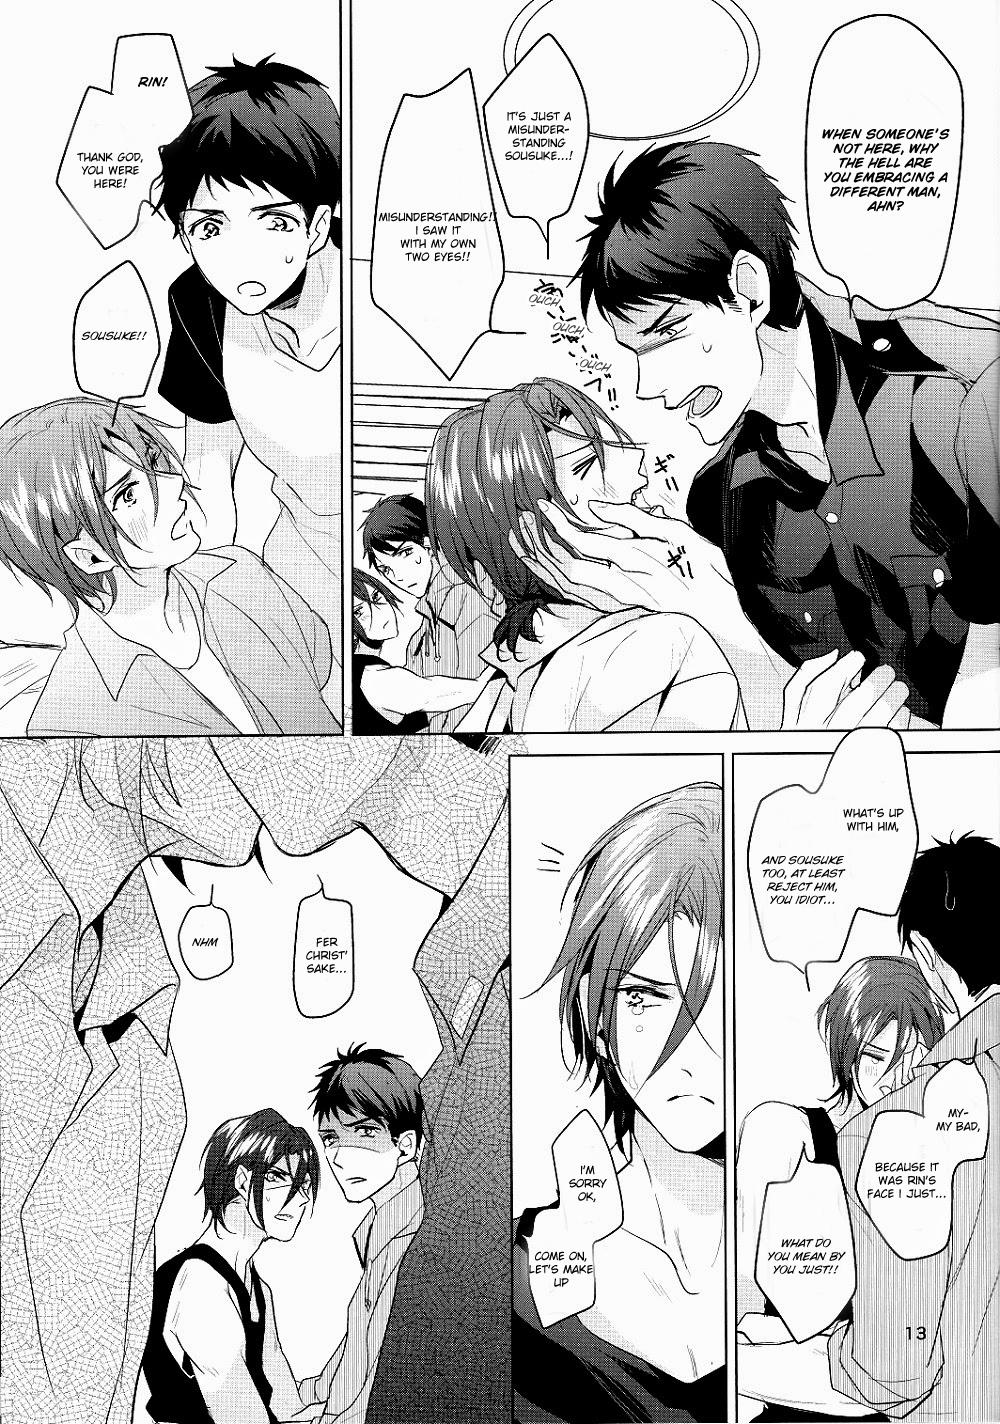 Ore no Sosuke | My Sosuke 11